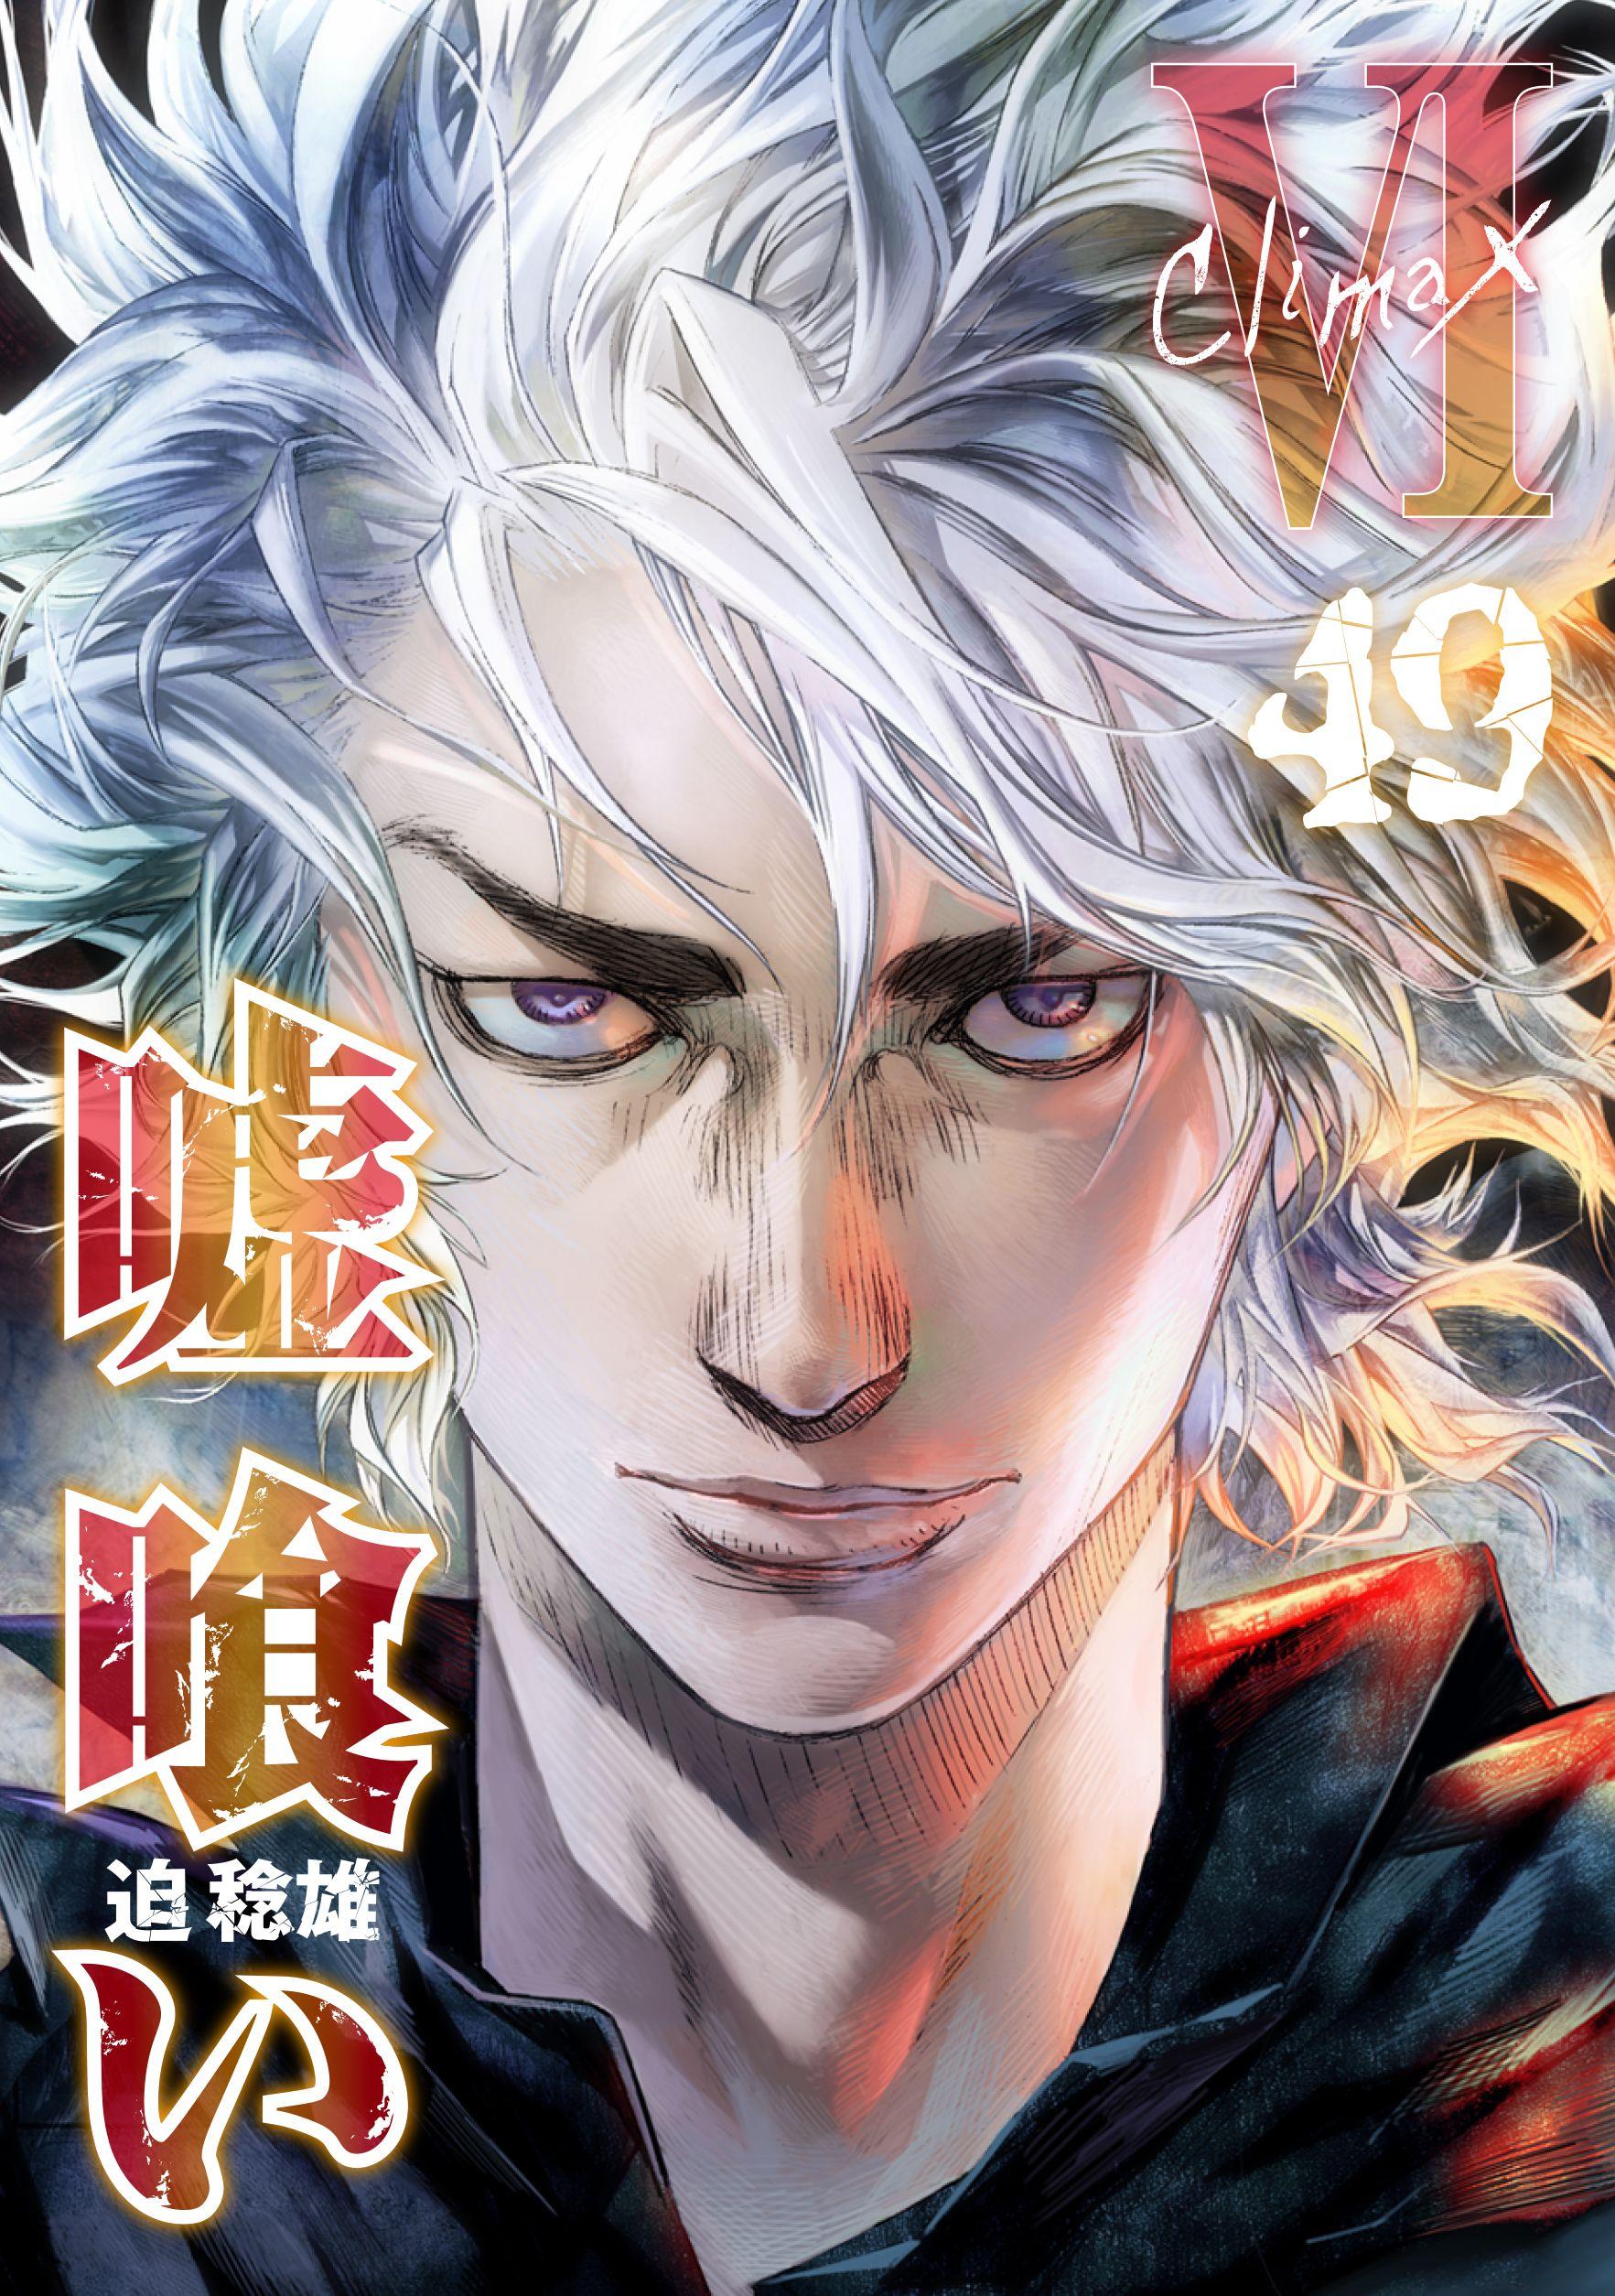 Clip Studio Paint Software App For Manga Comics Drawing And Painting Manga Free Manga Online Manga English